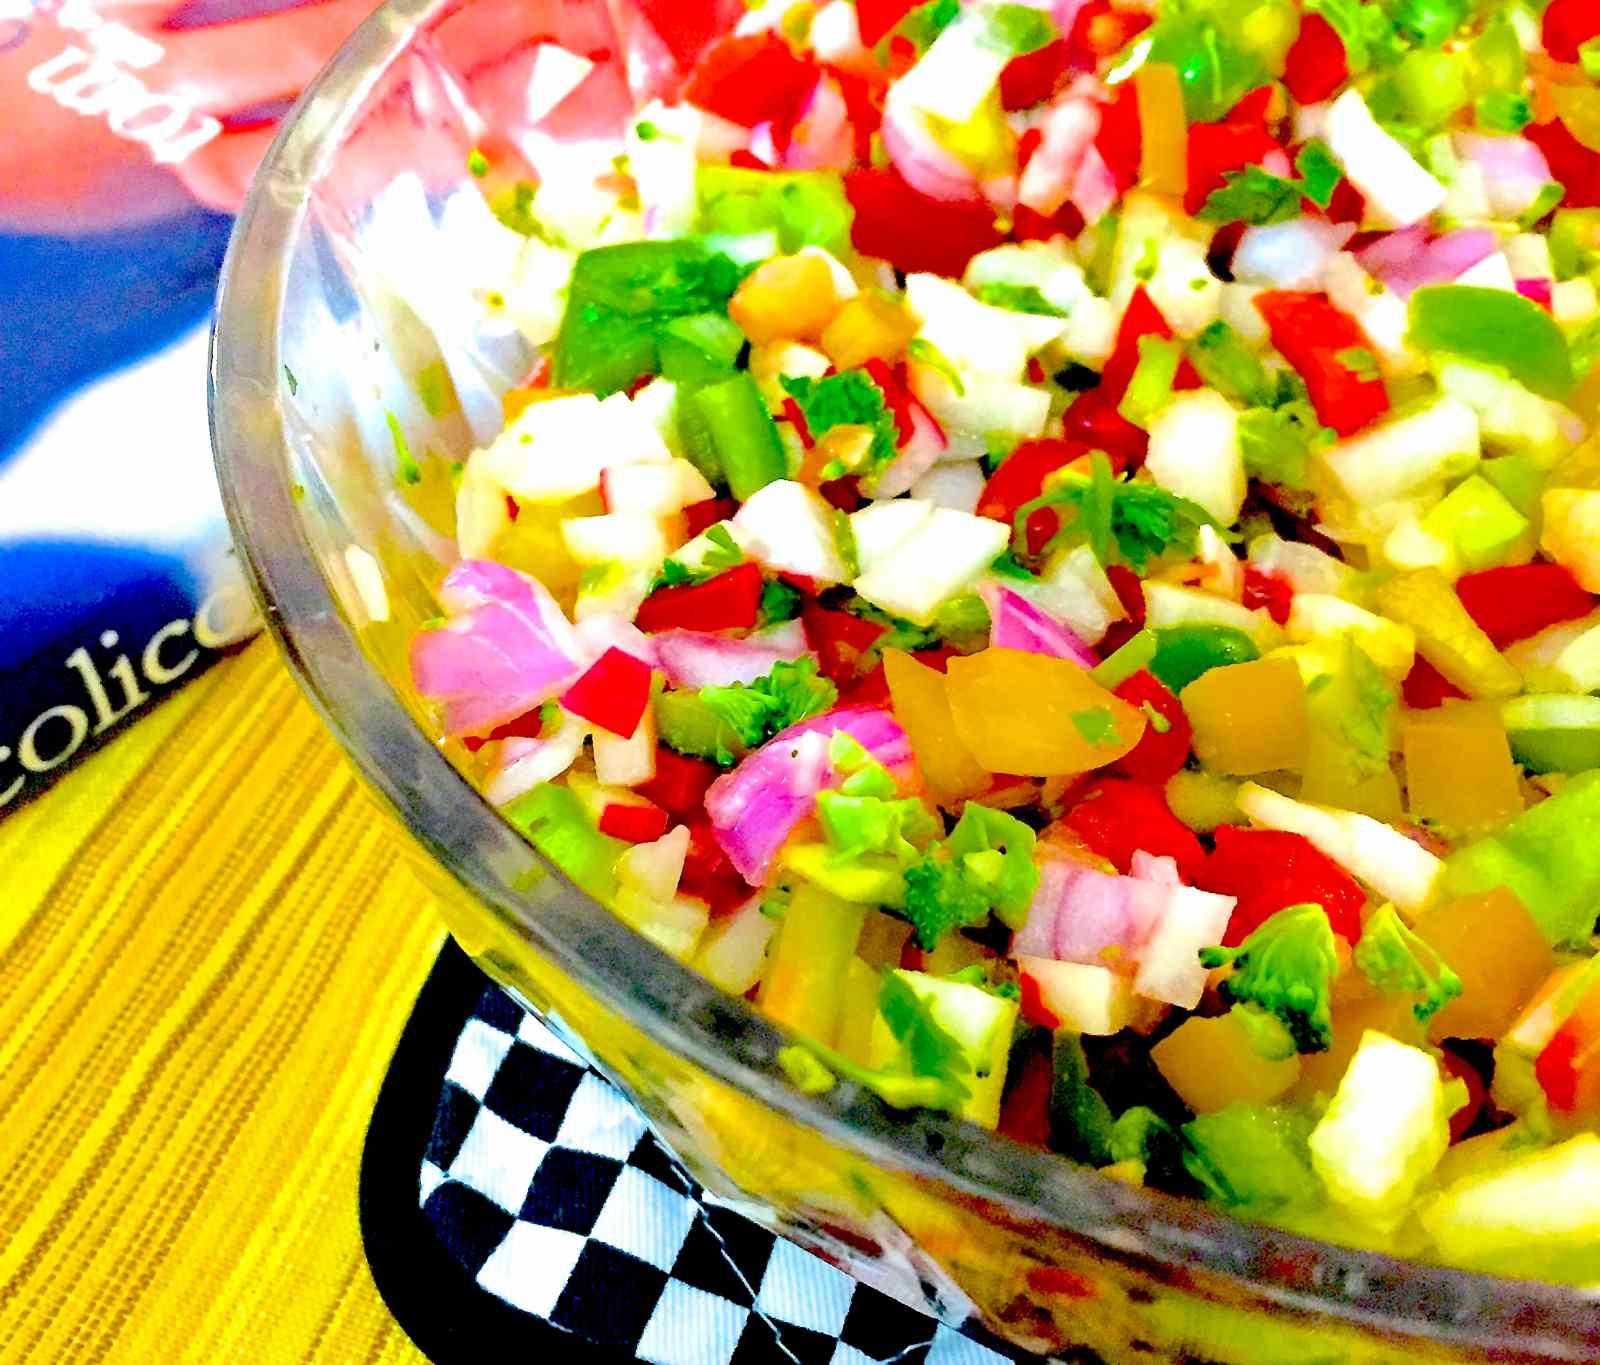 how to make apple salad dressing